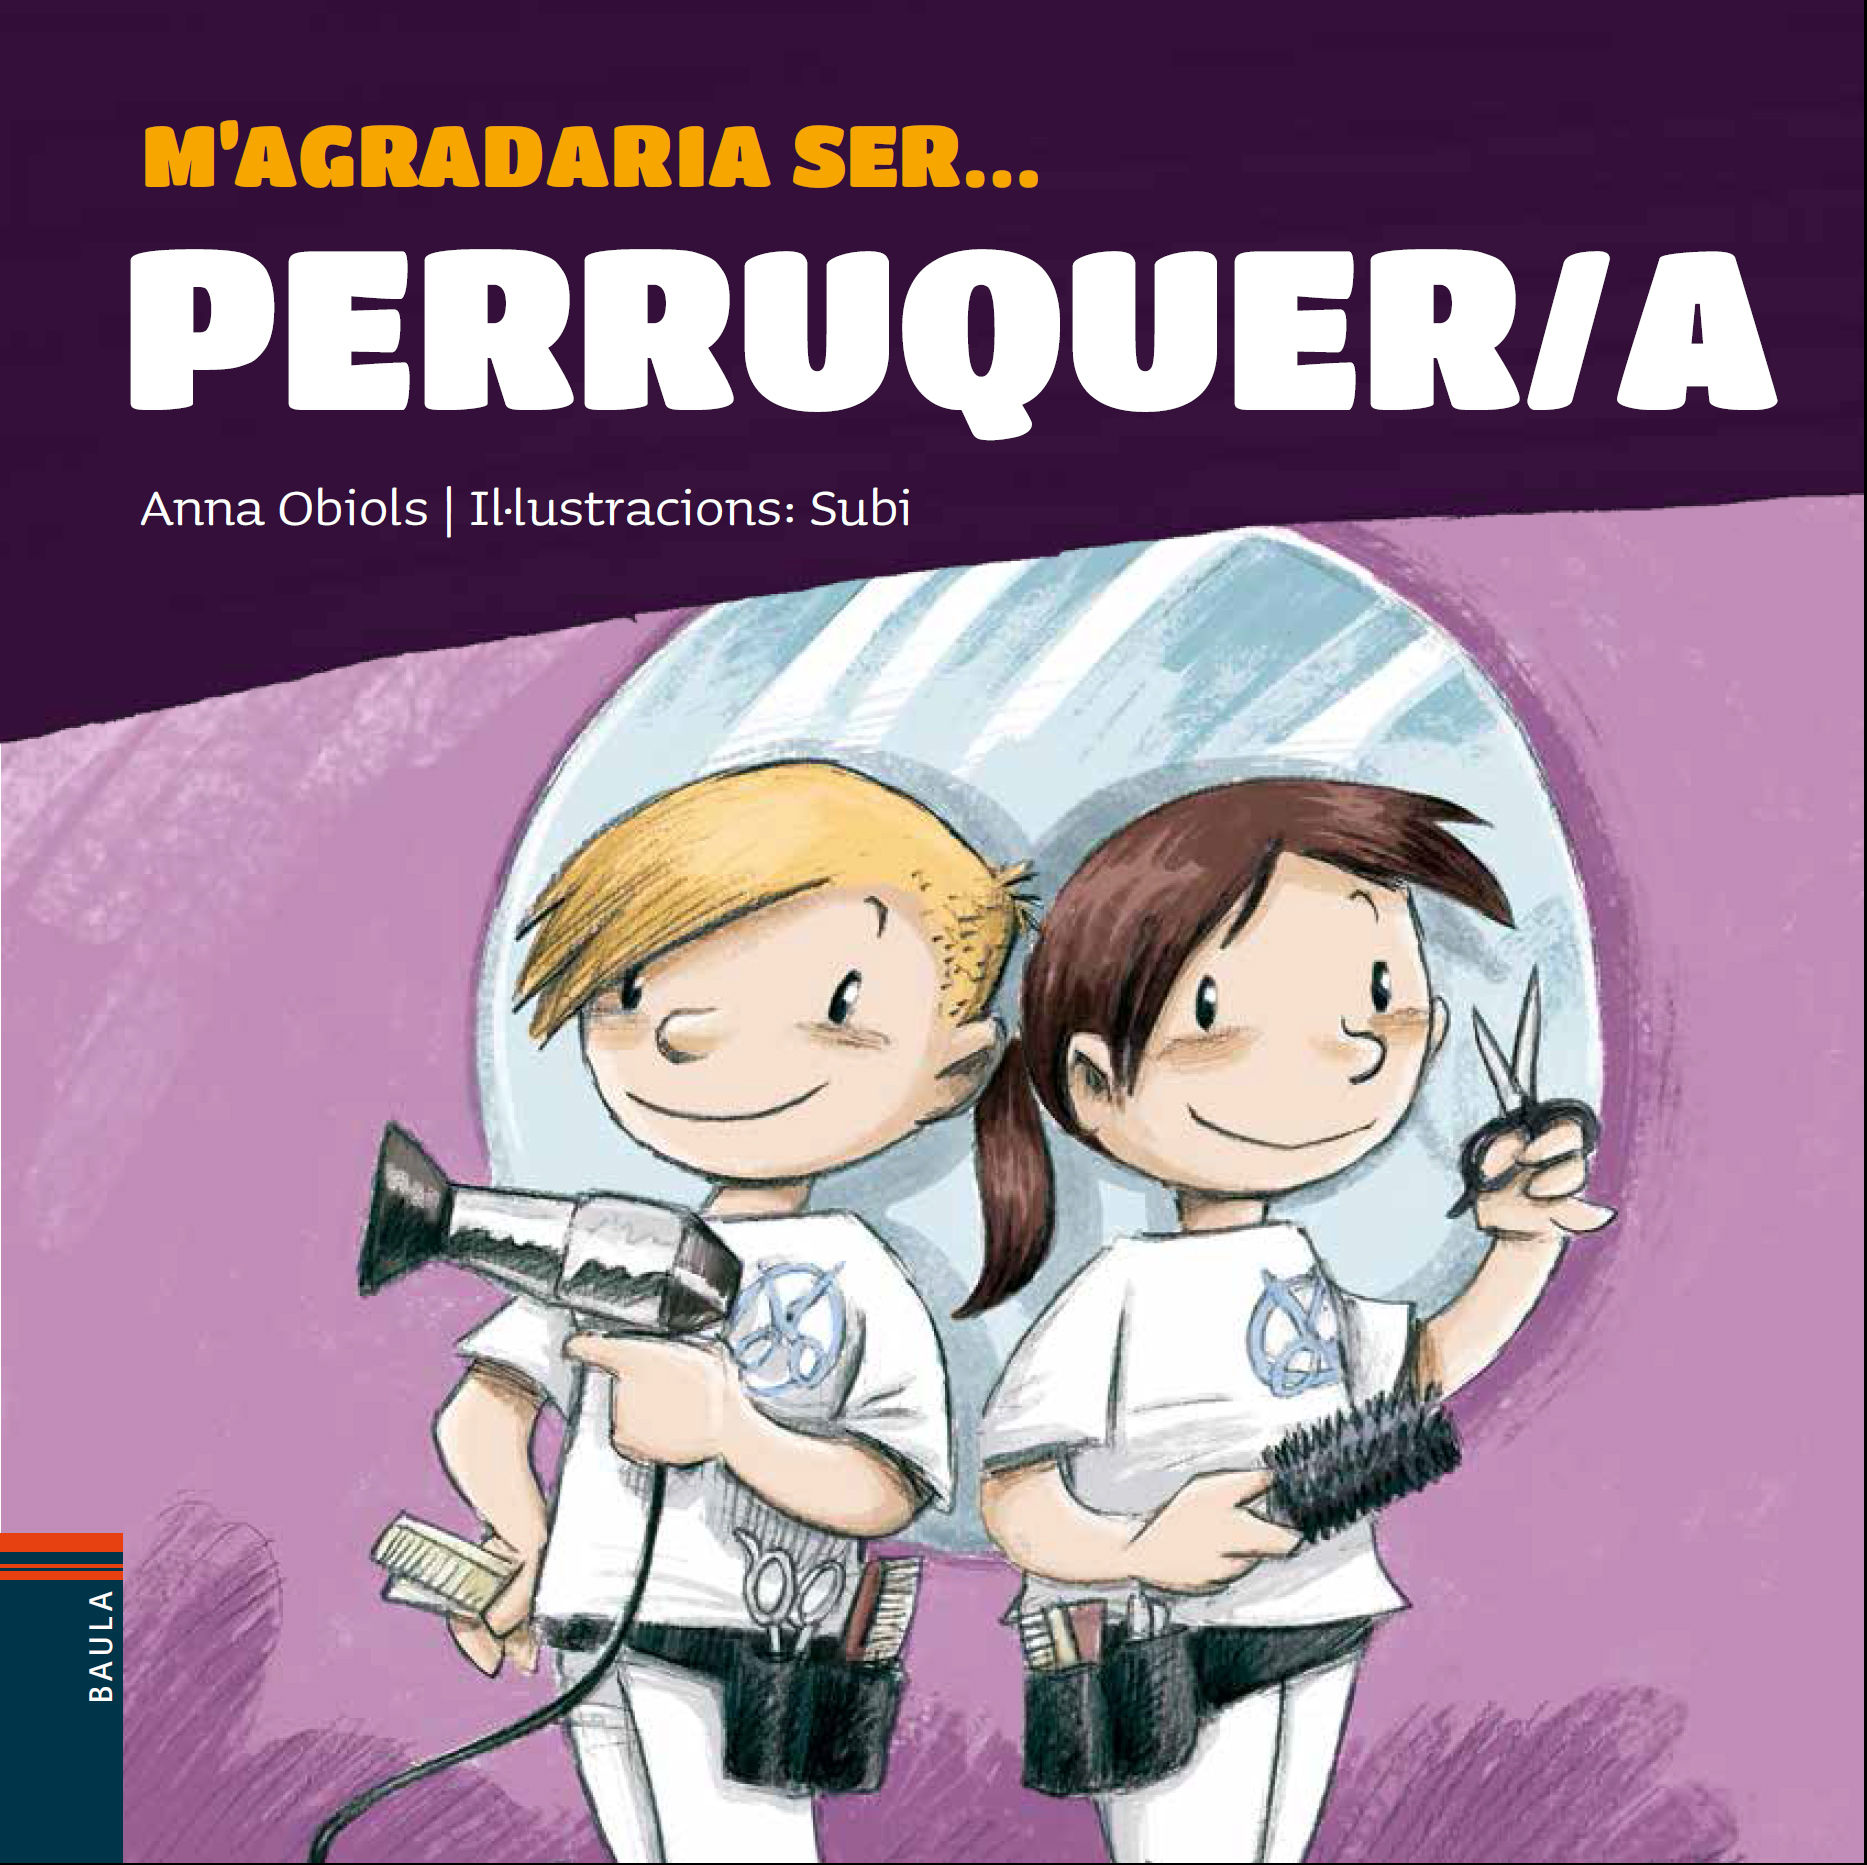 AGRADARIA SER PERRUQUER/A M